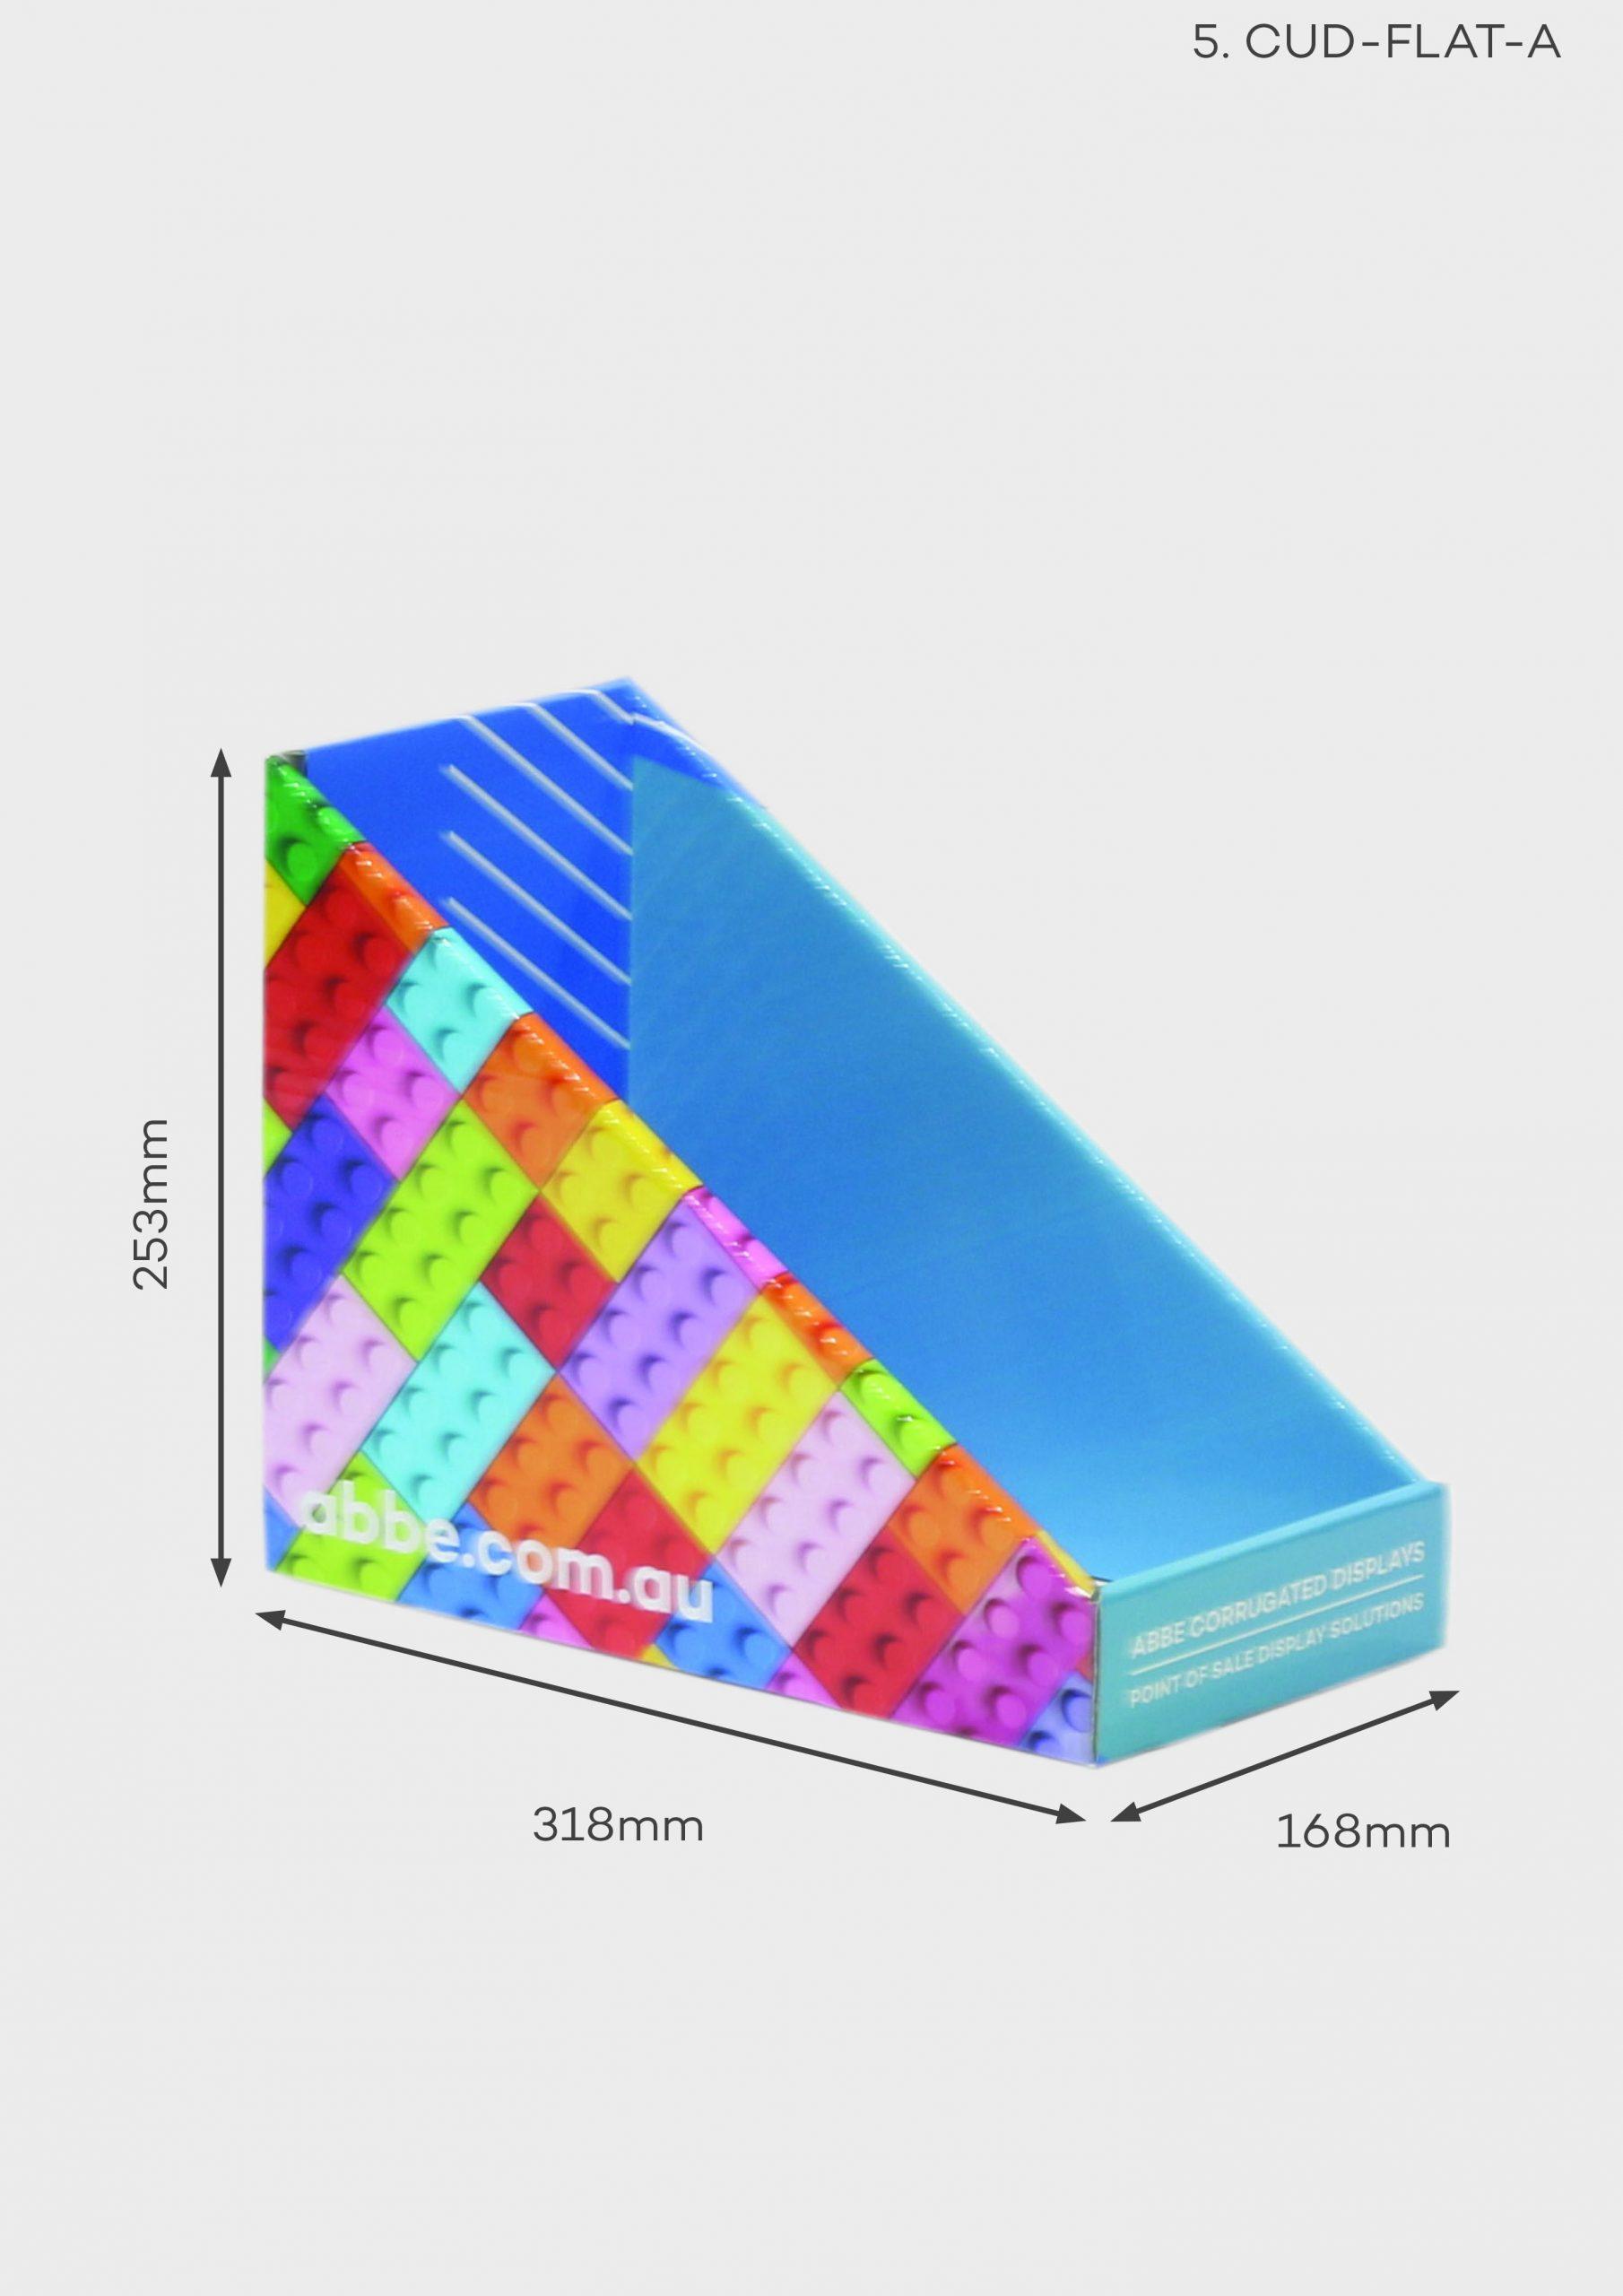 Small Deep Counter Display (Ref CUD-FLAT-A)